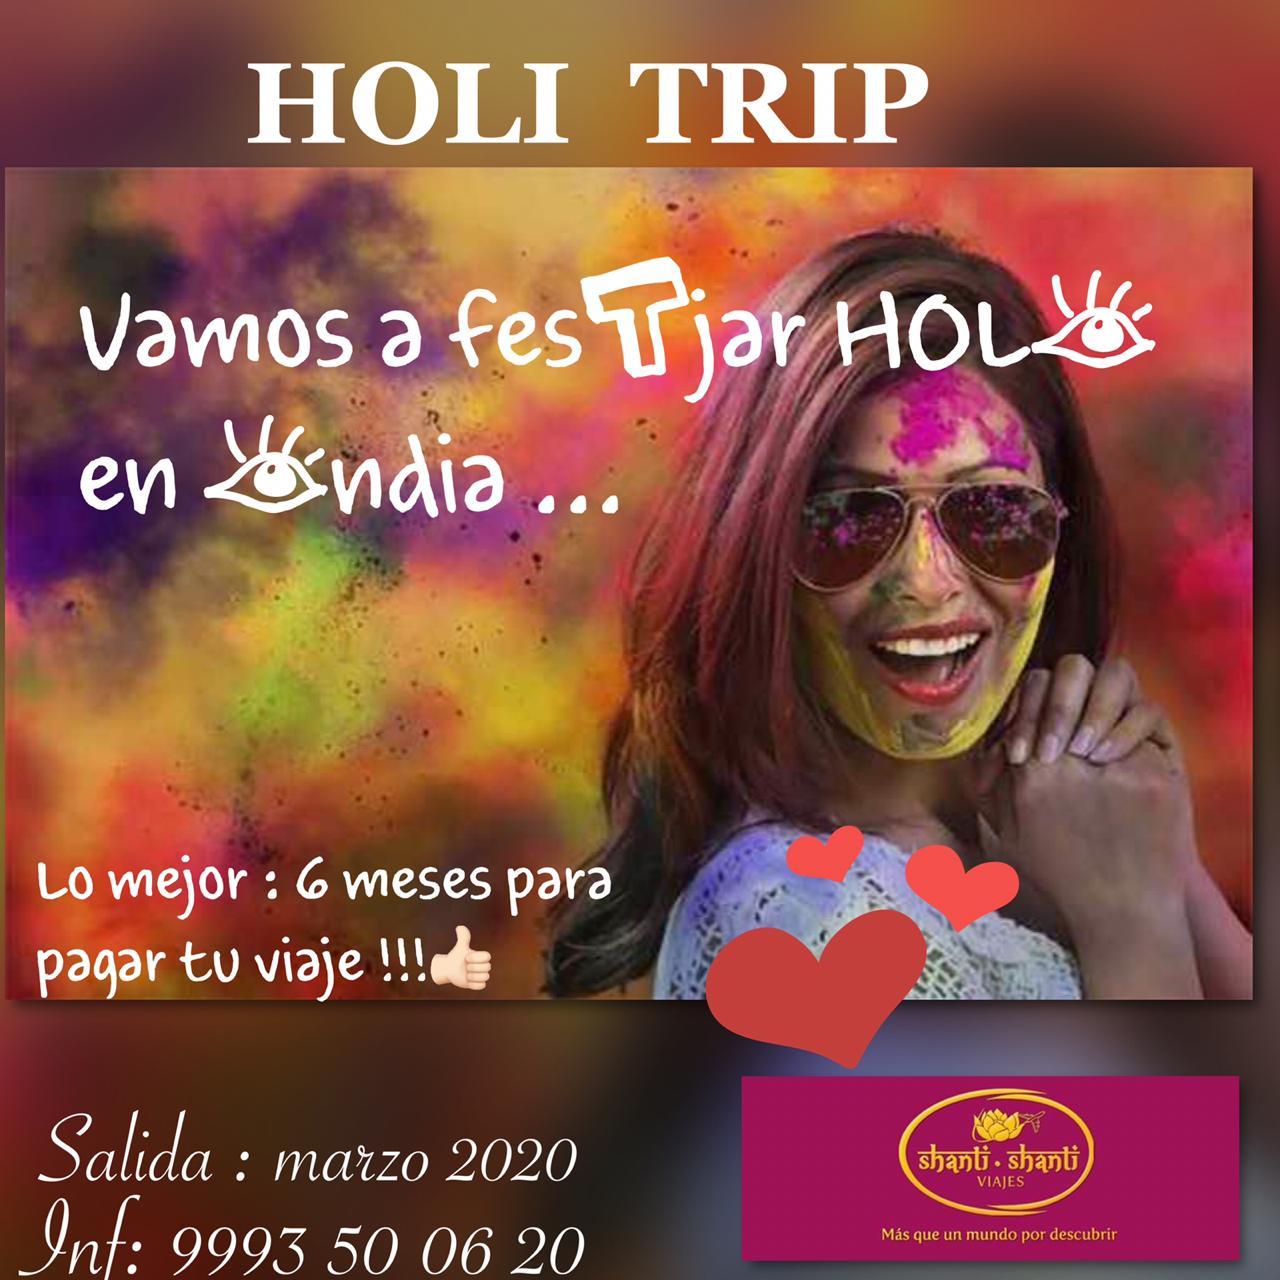 HOLI TRIP